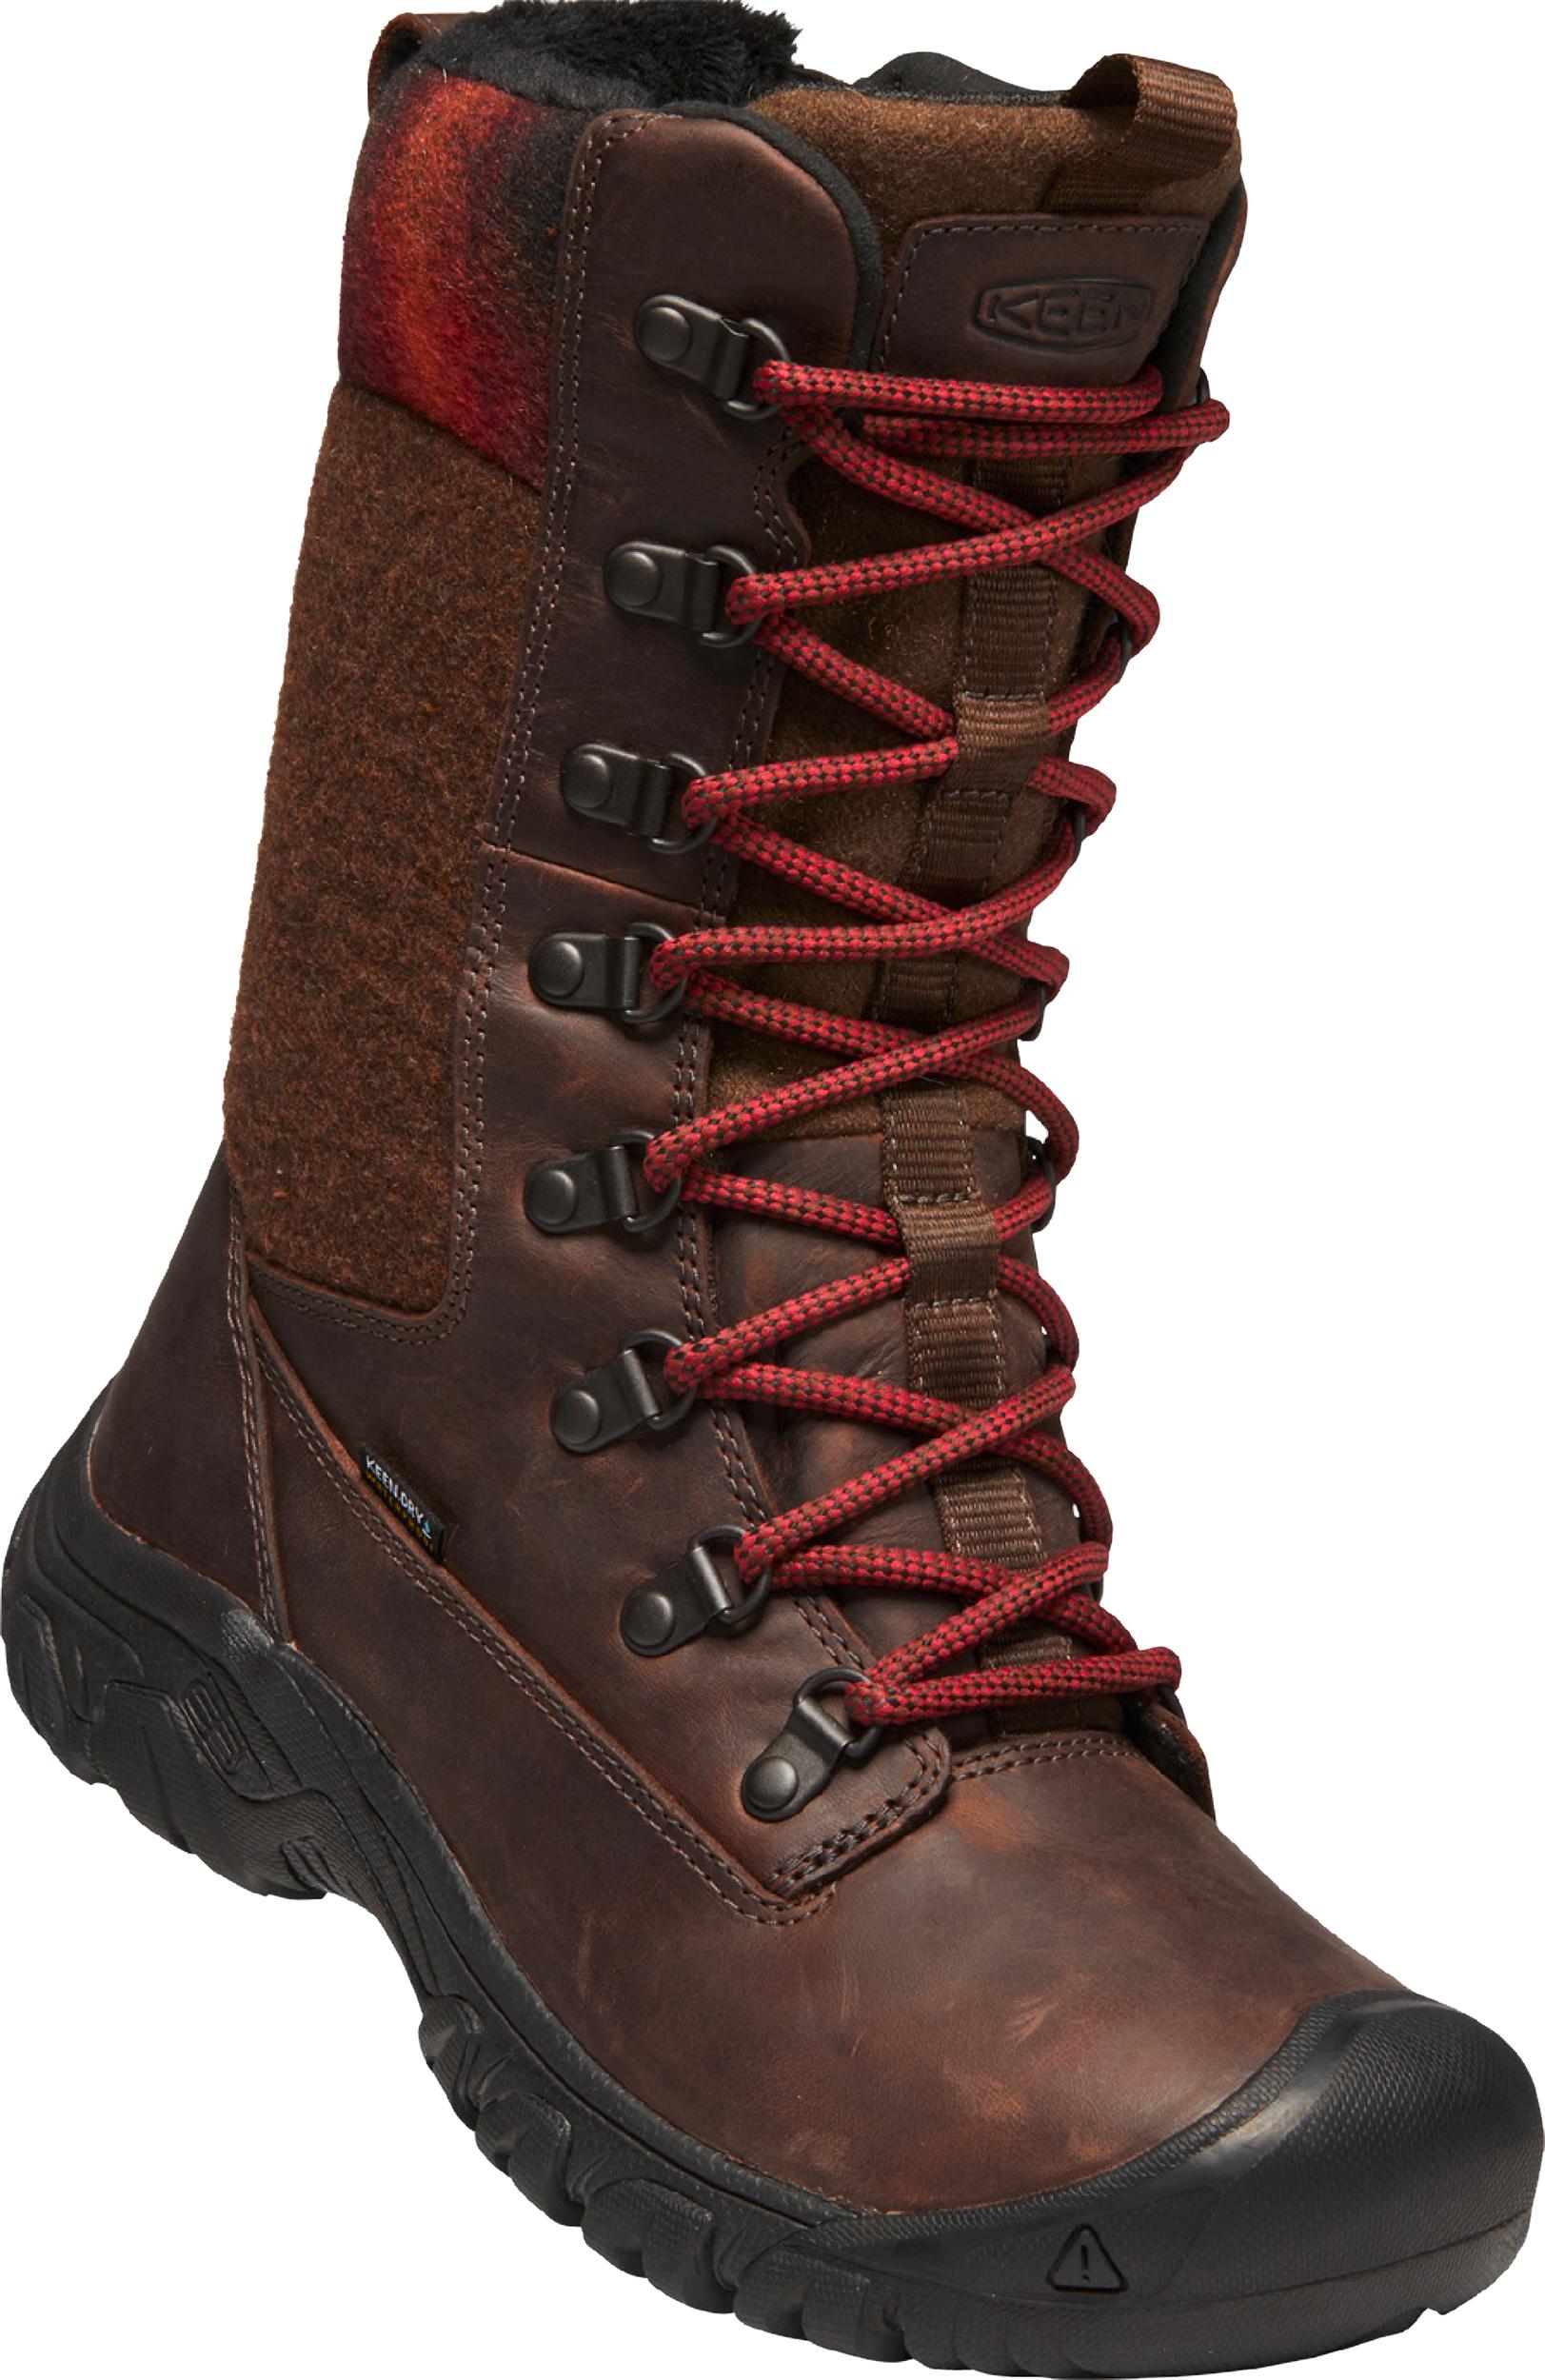 Keen Greta Tall Waterproof Winter Boots